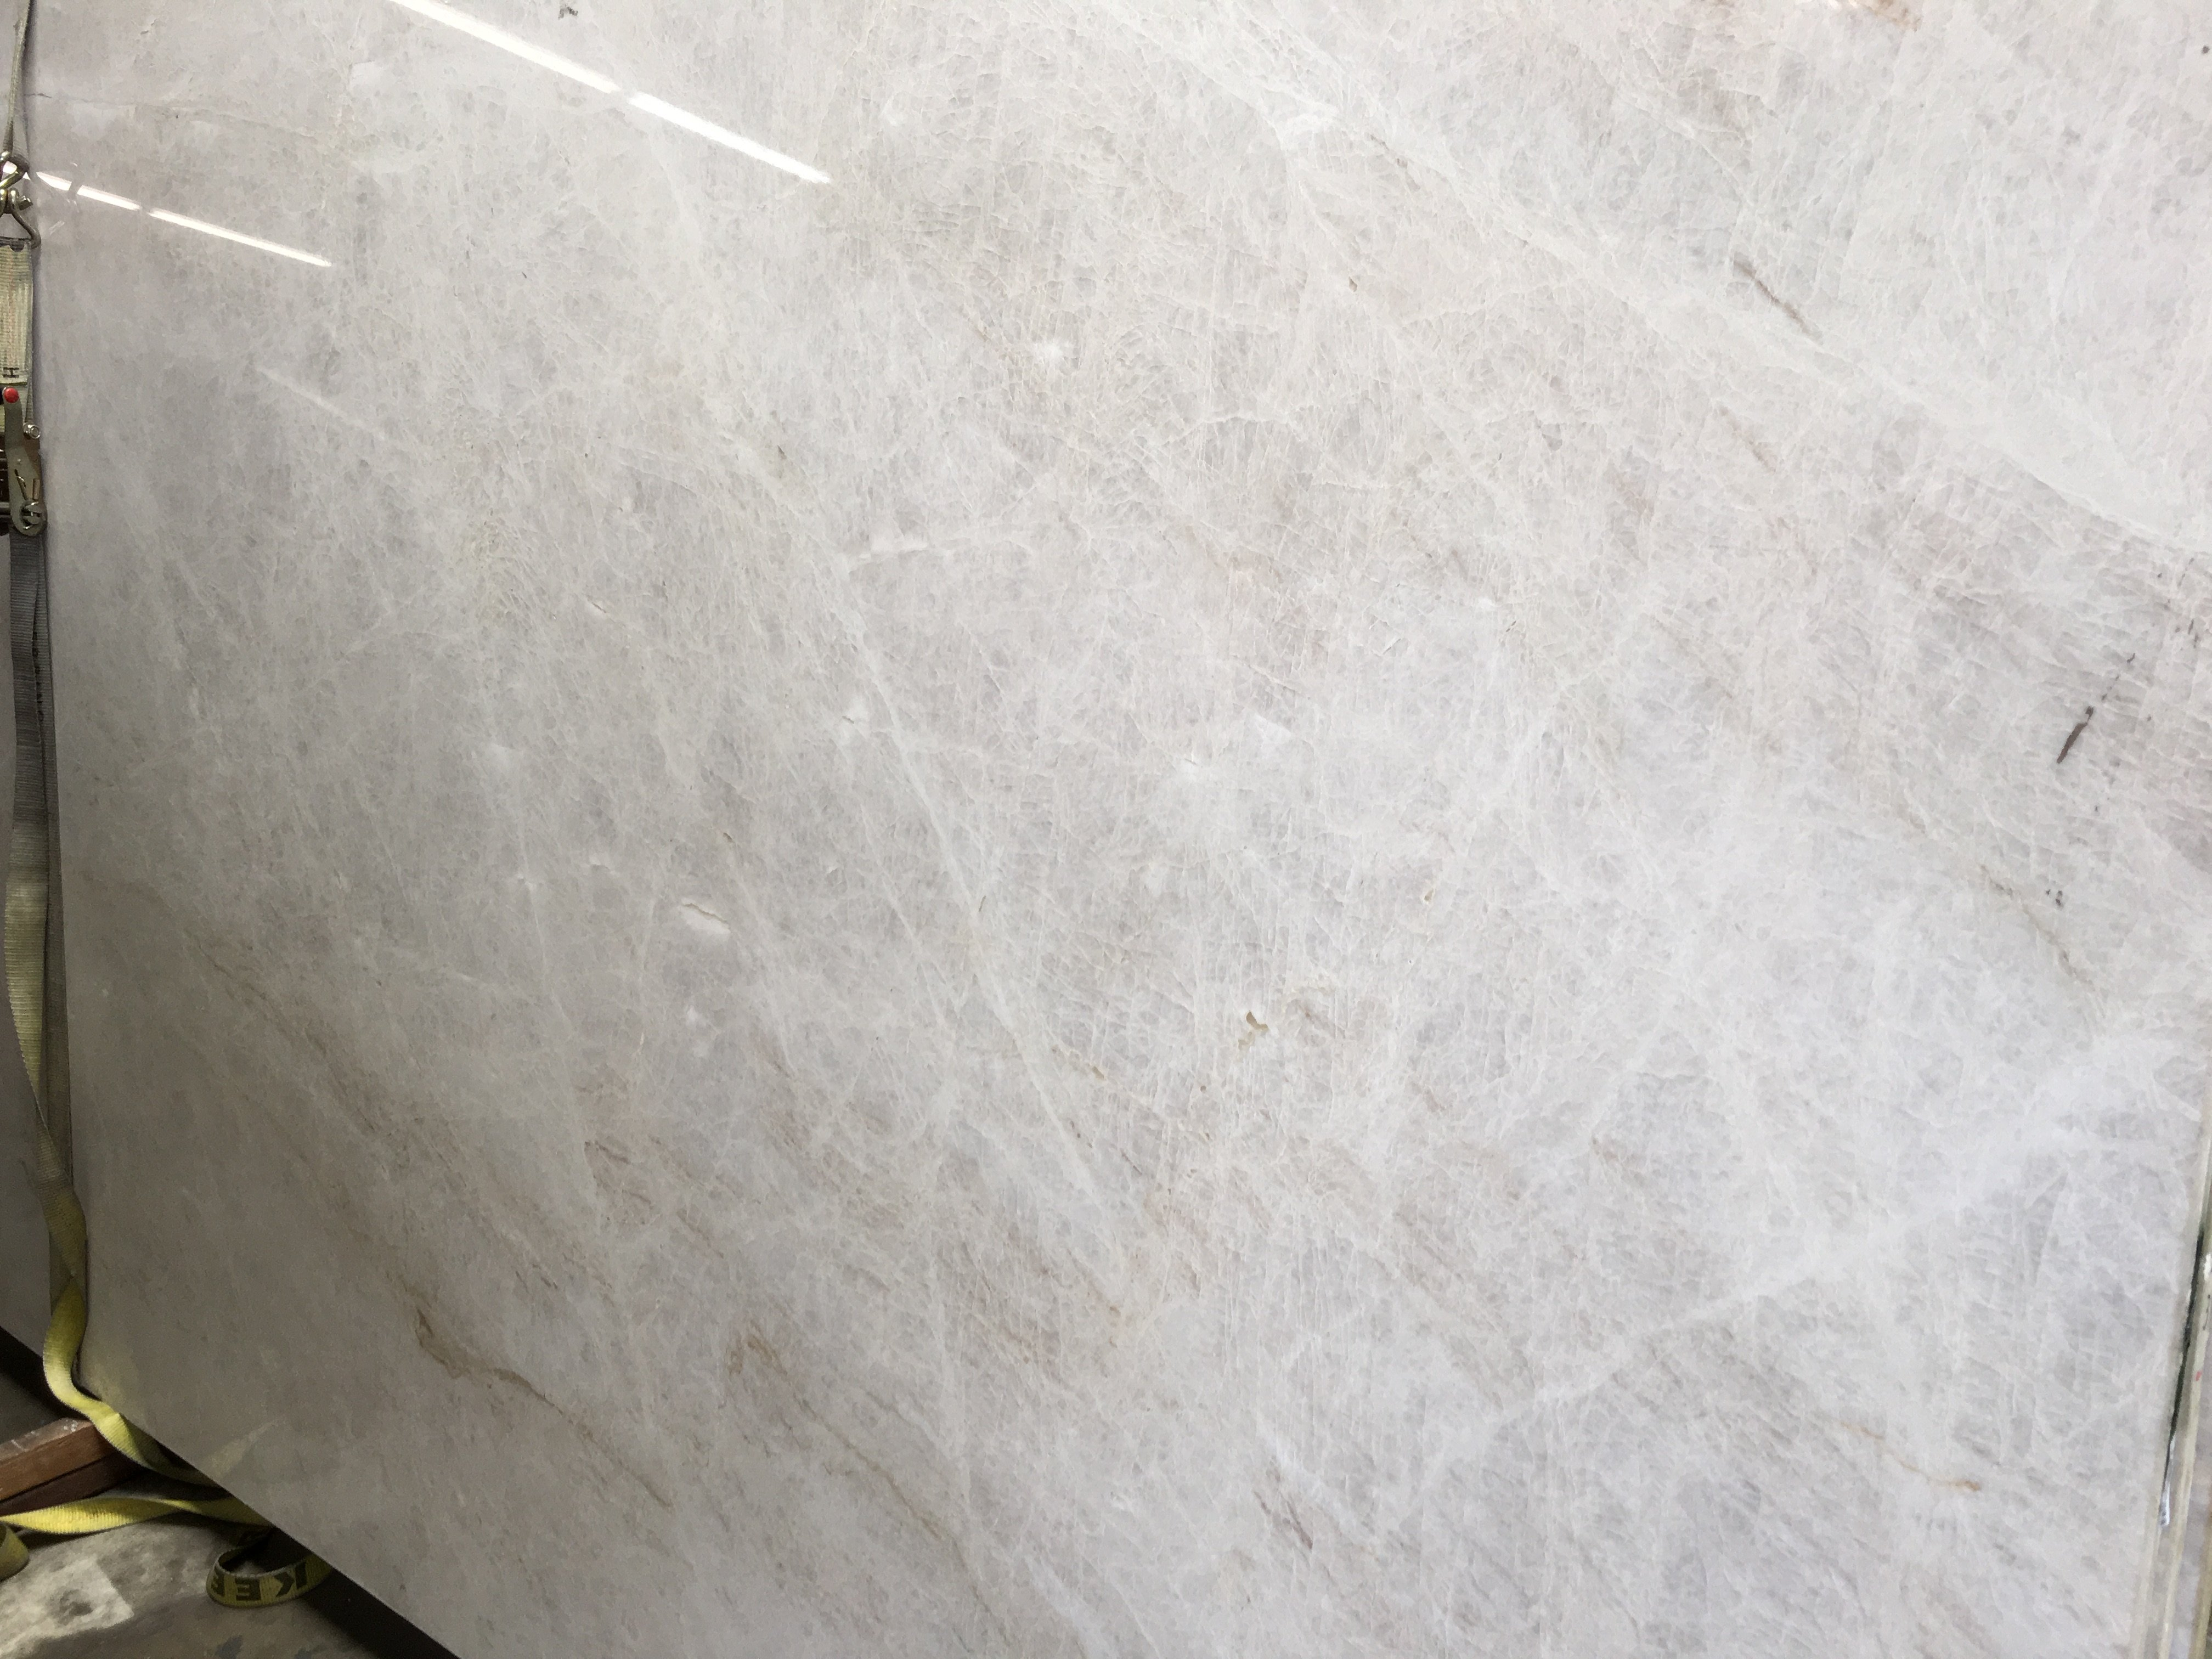 Perla Venato Polished Quartzite Slab Trendy Surfaces